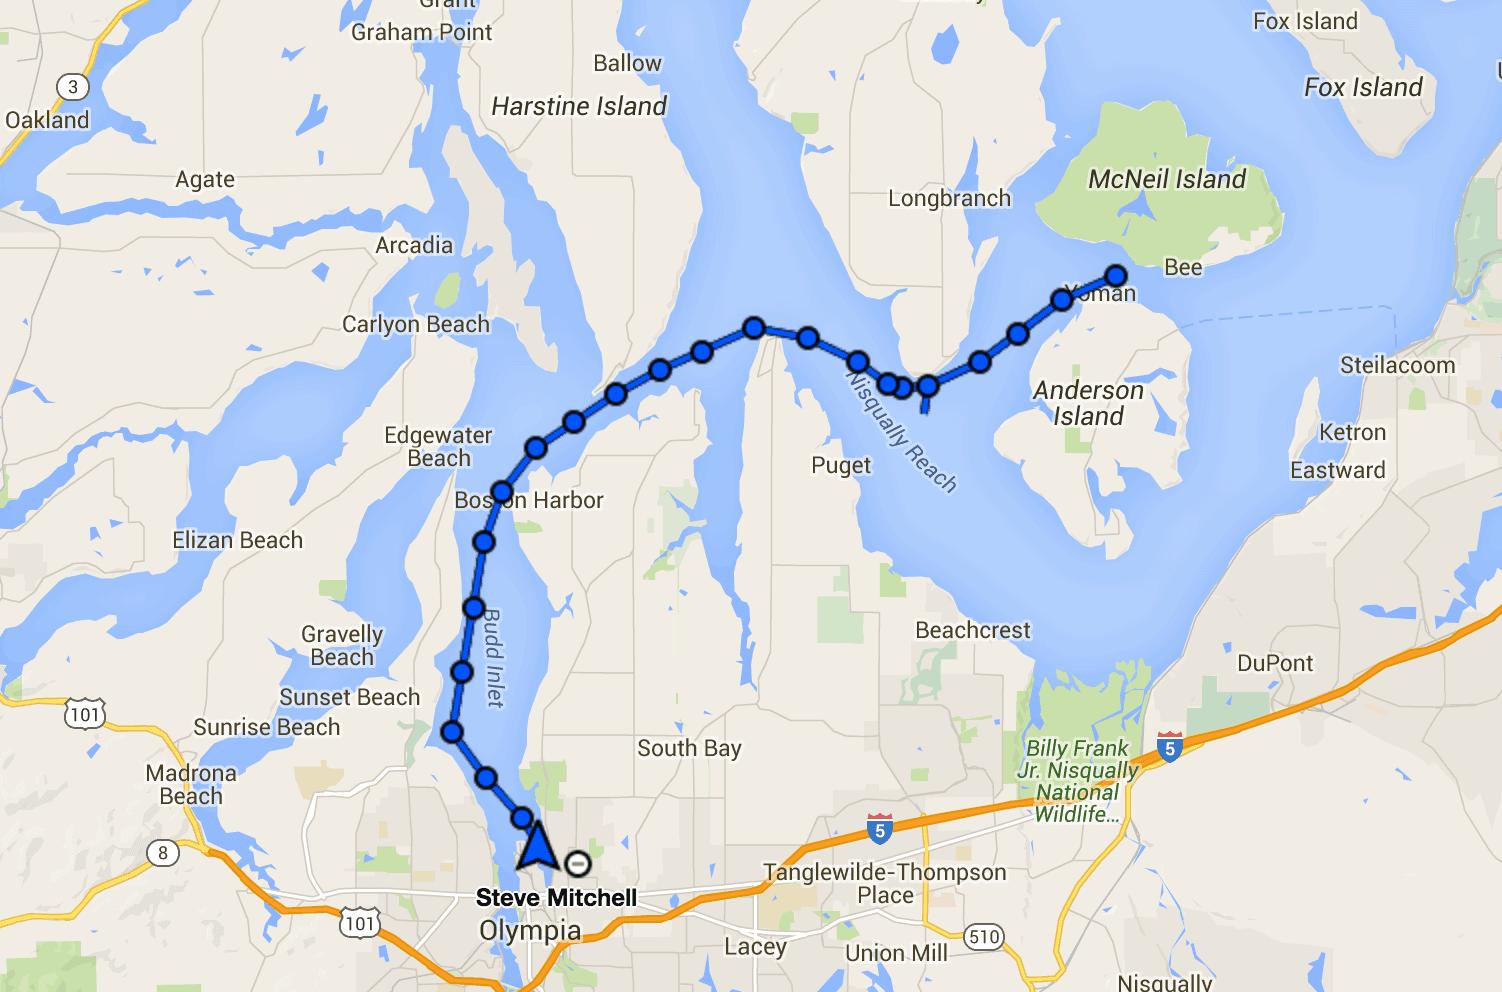 Eagle Island to Olympia track via DeLorme InReach Explorer